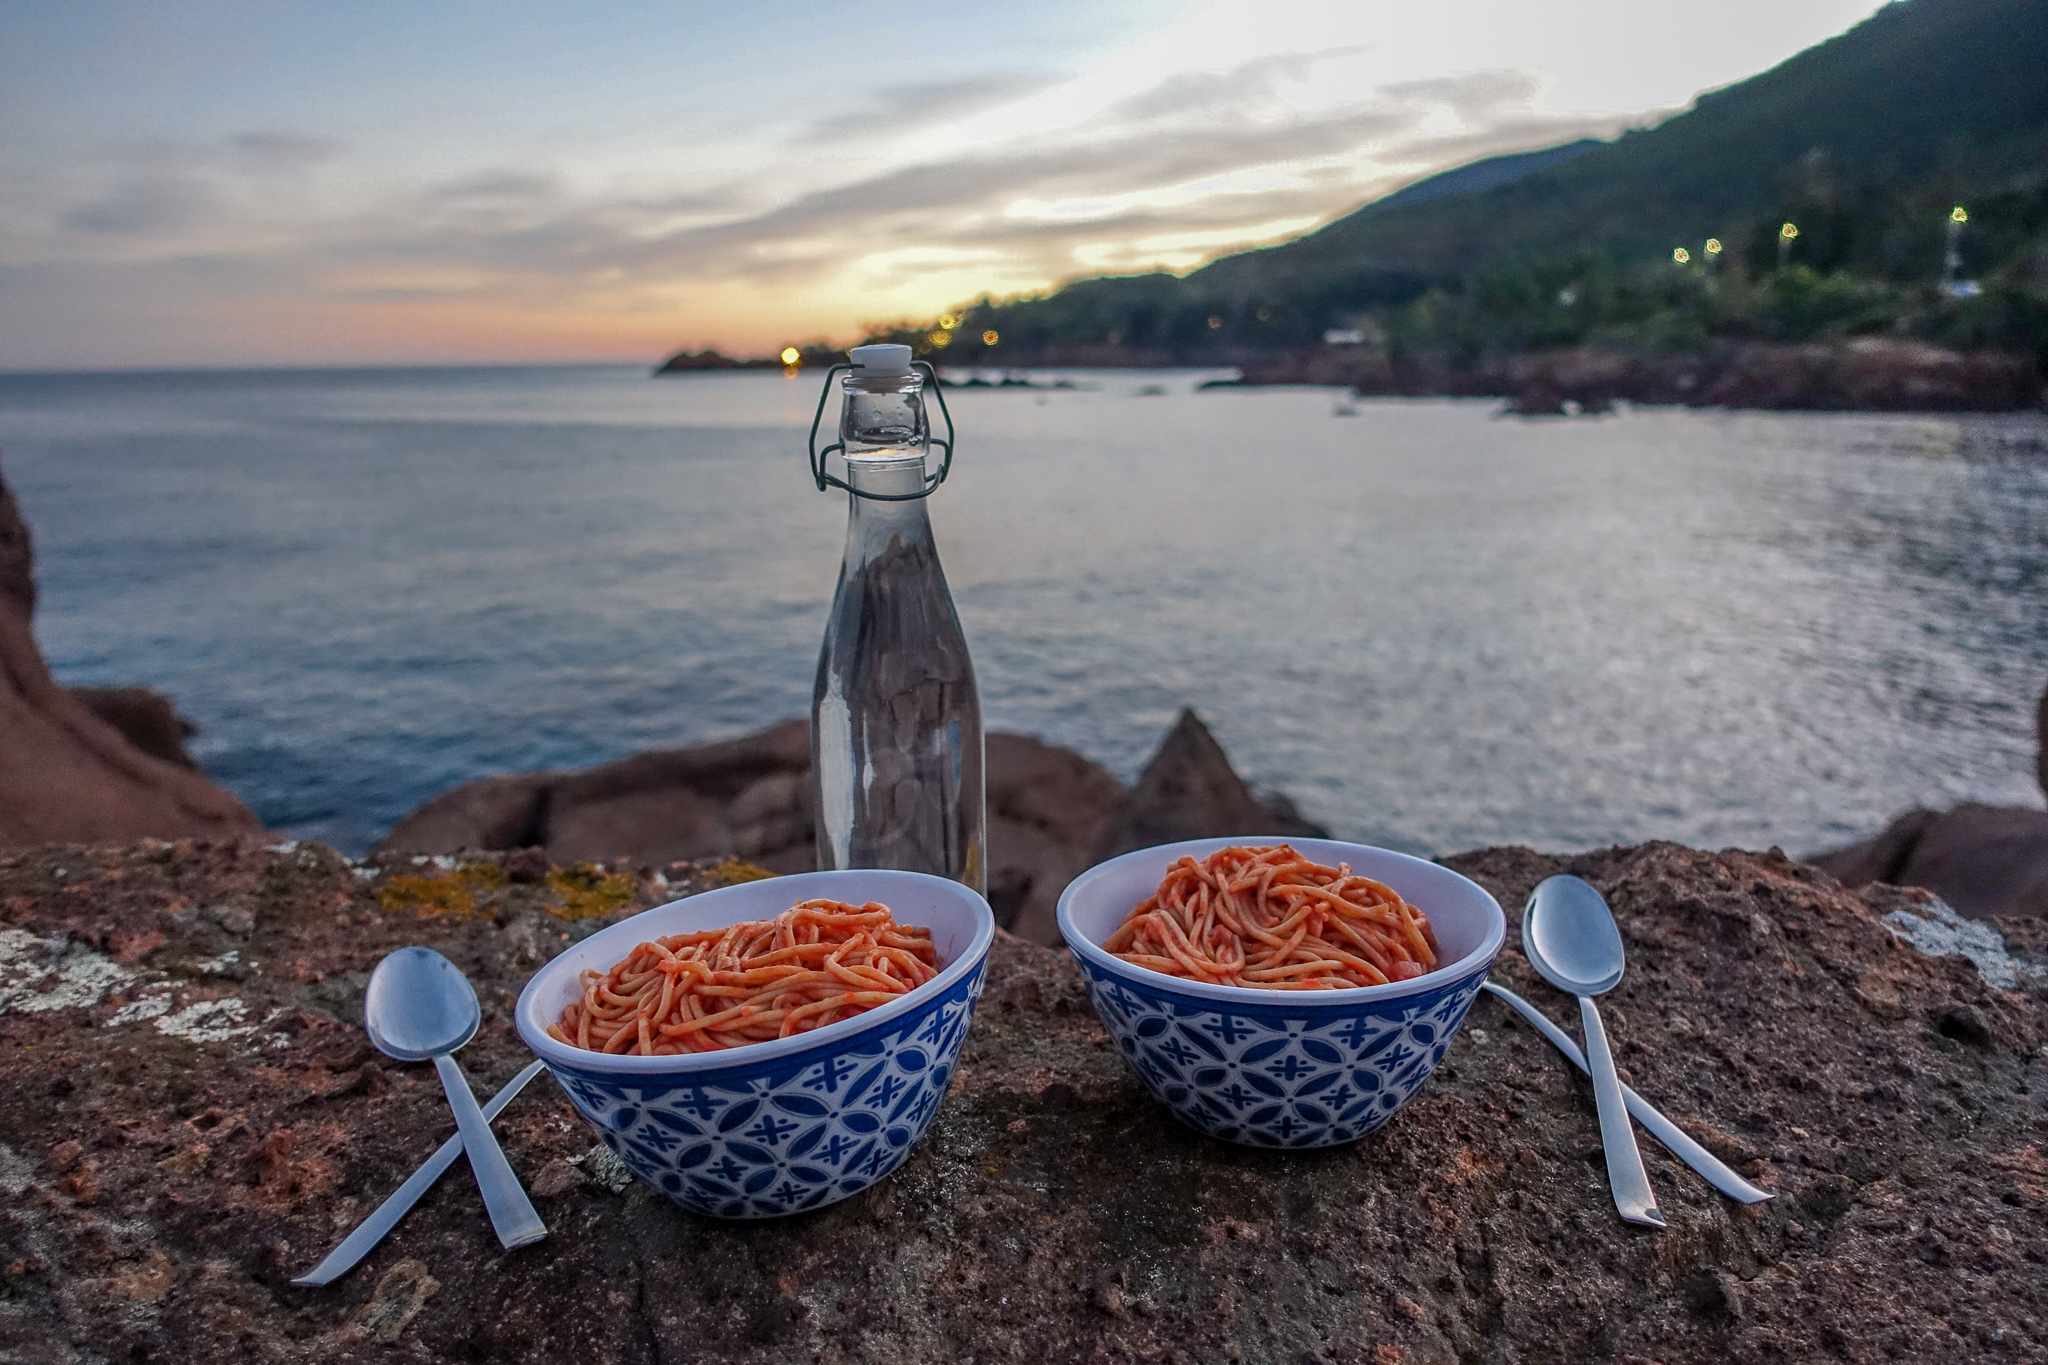 günstig-kochen-essen-reisen-rezept-nudeln-tomatensoße